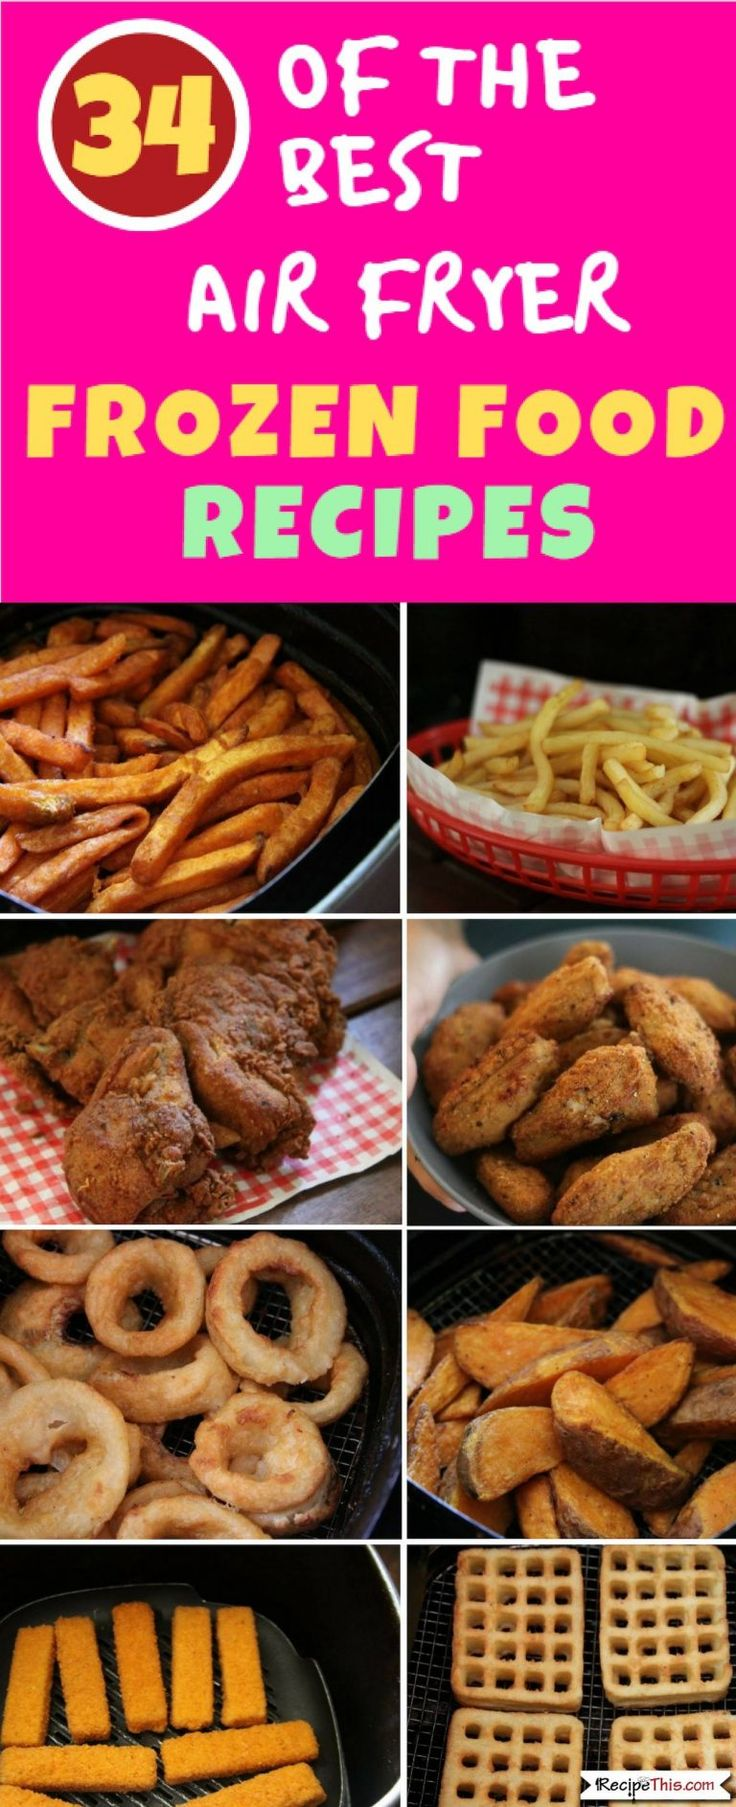 Air Fryer Frozen Food For Beginners Air fryer oven